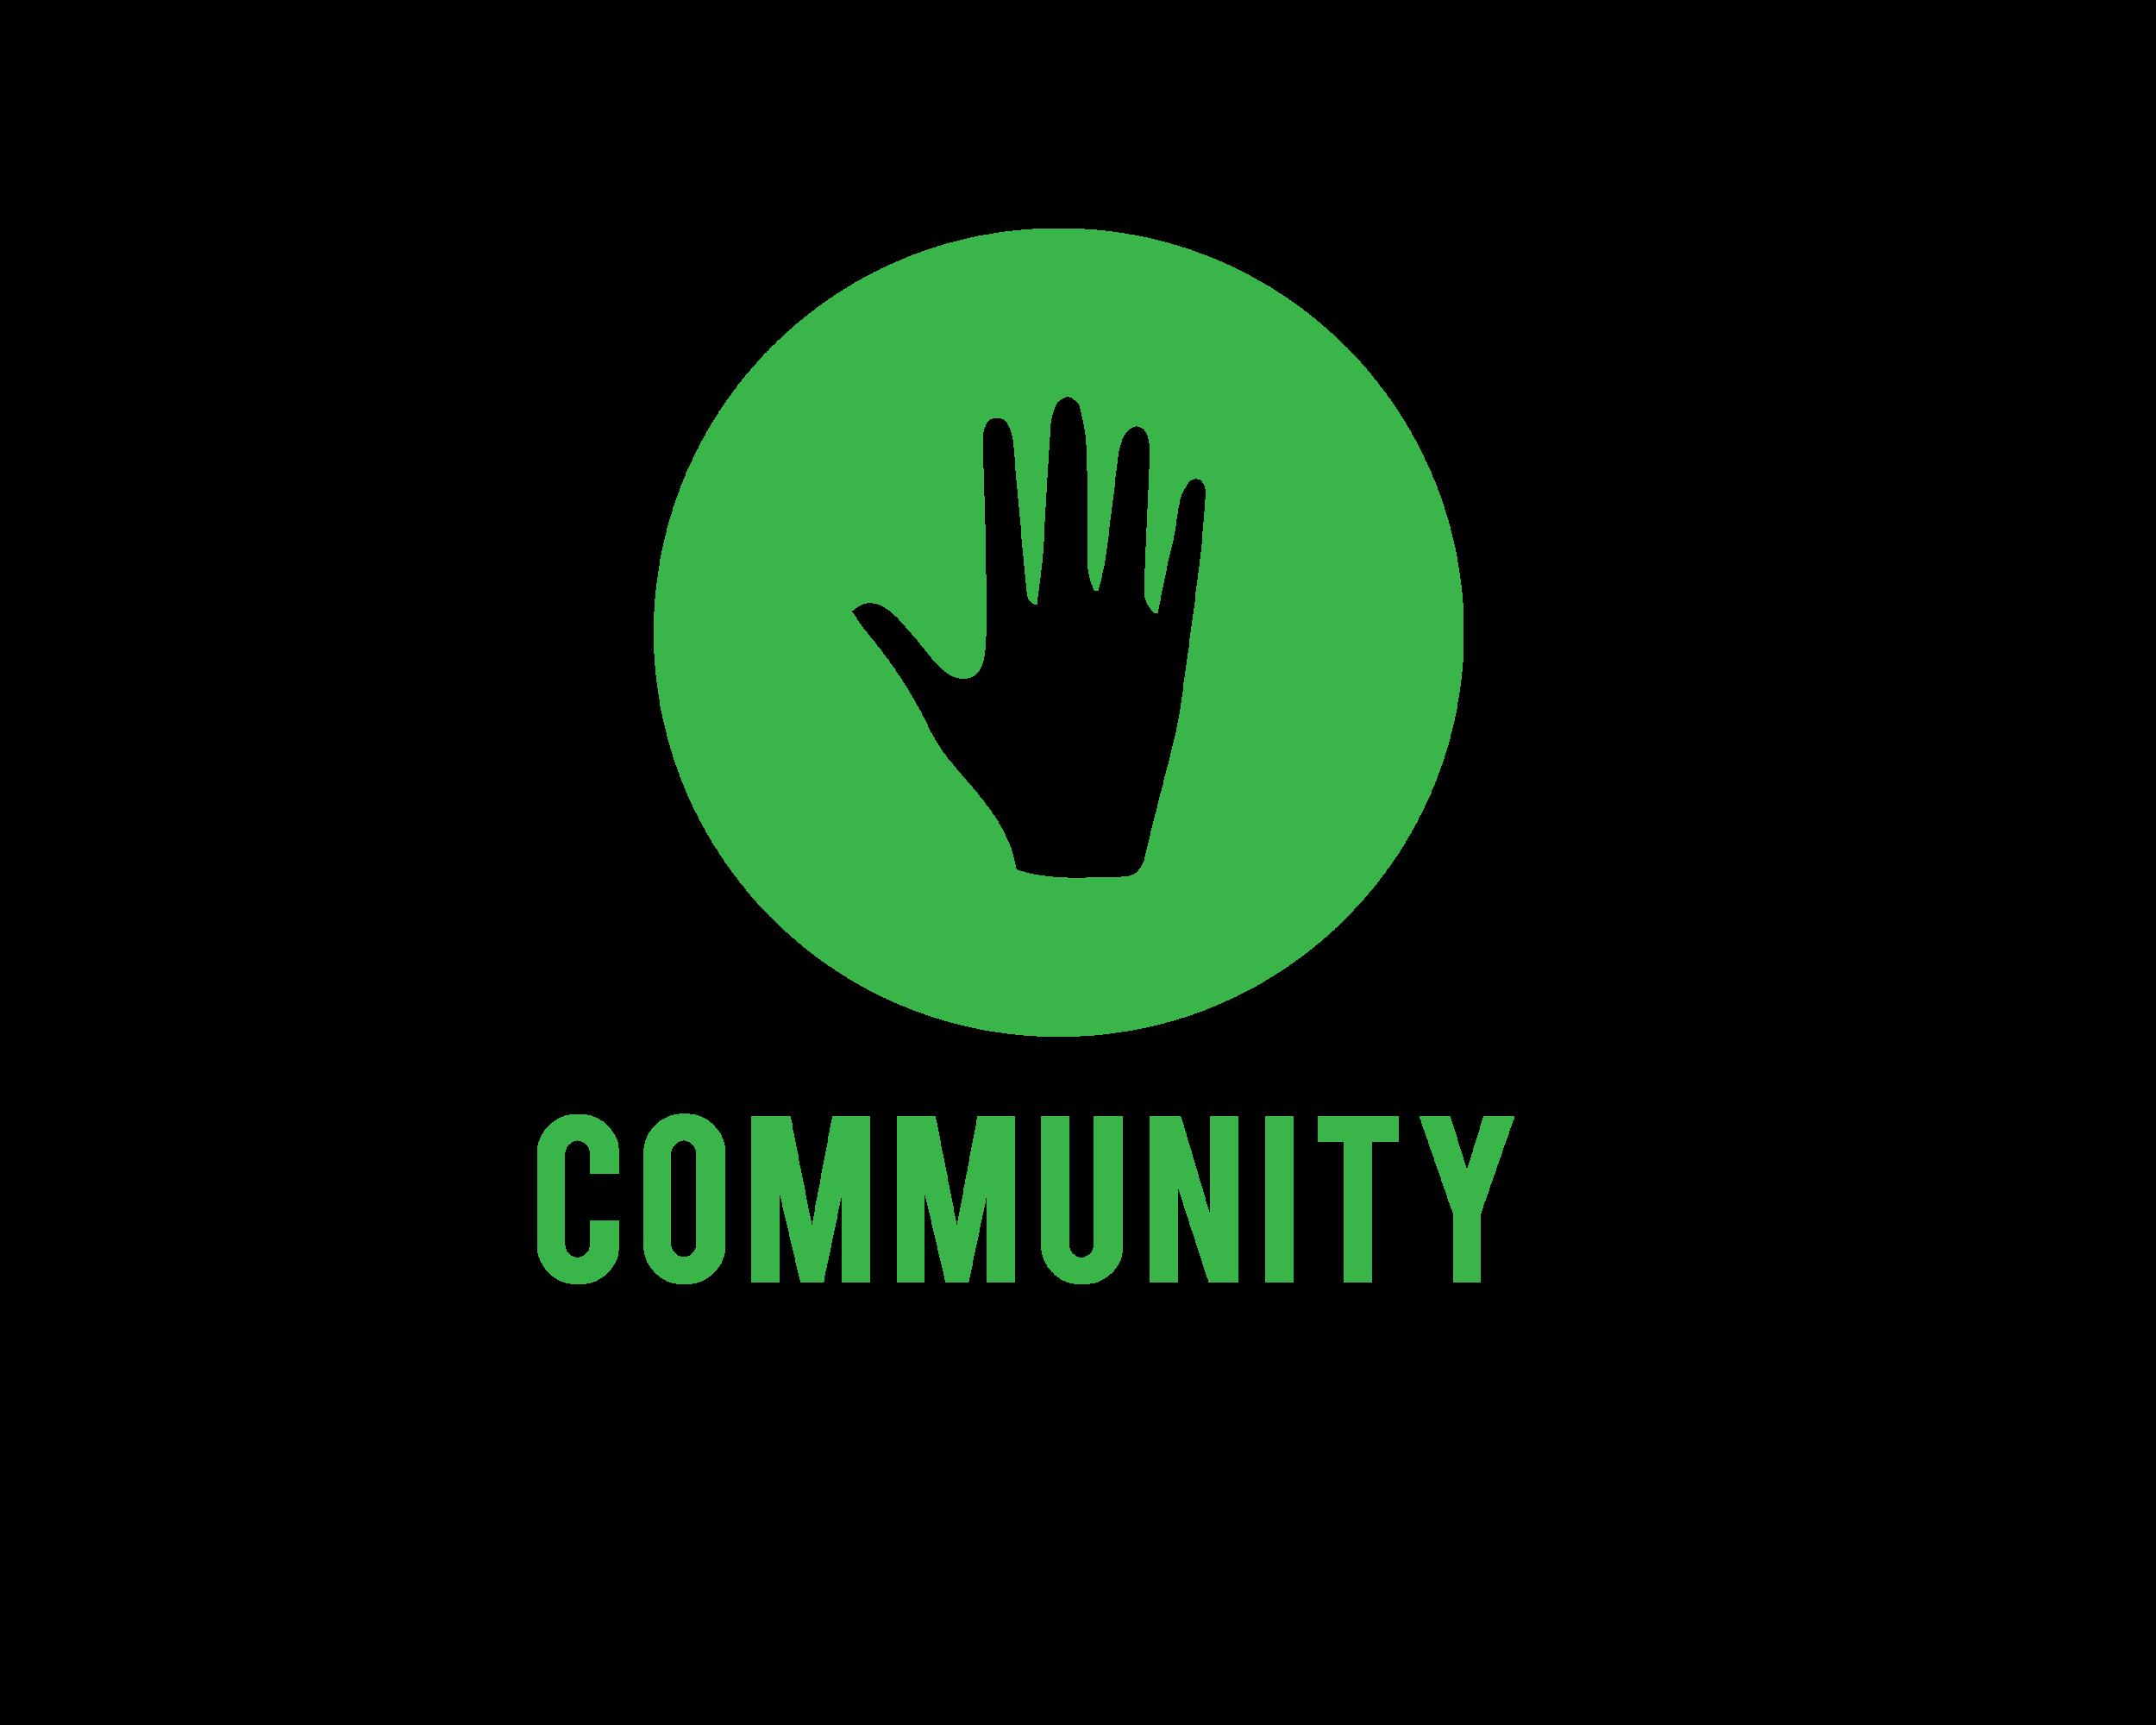 community-symbol-02.png